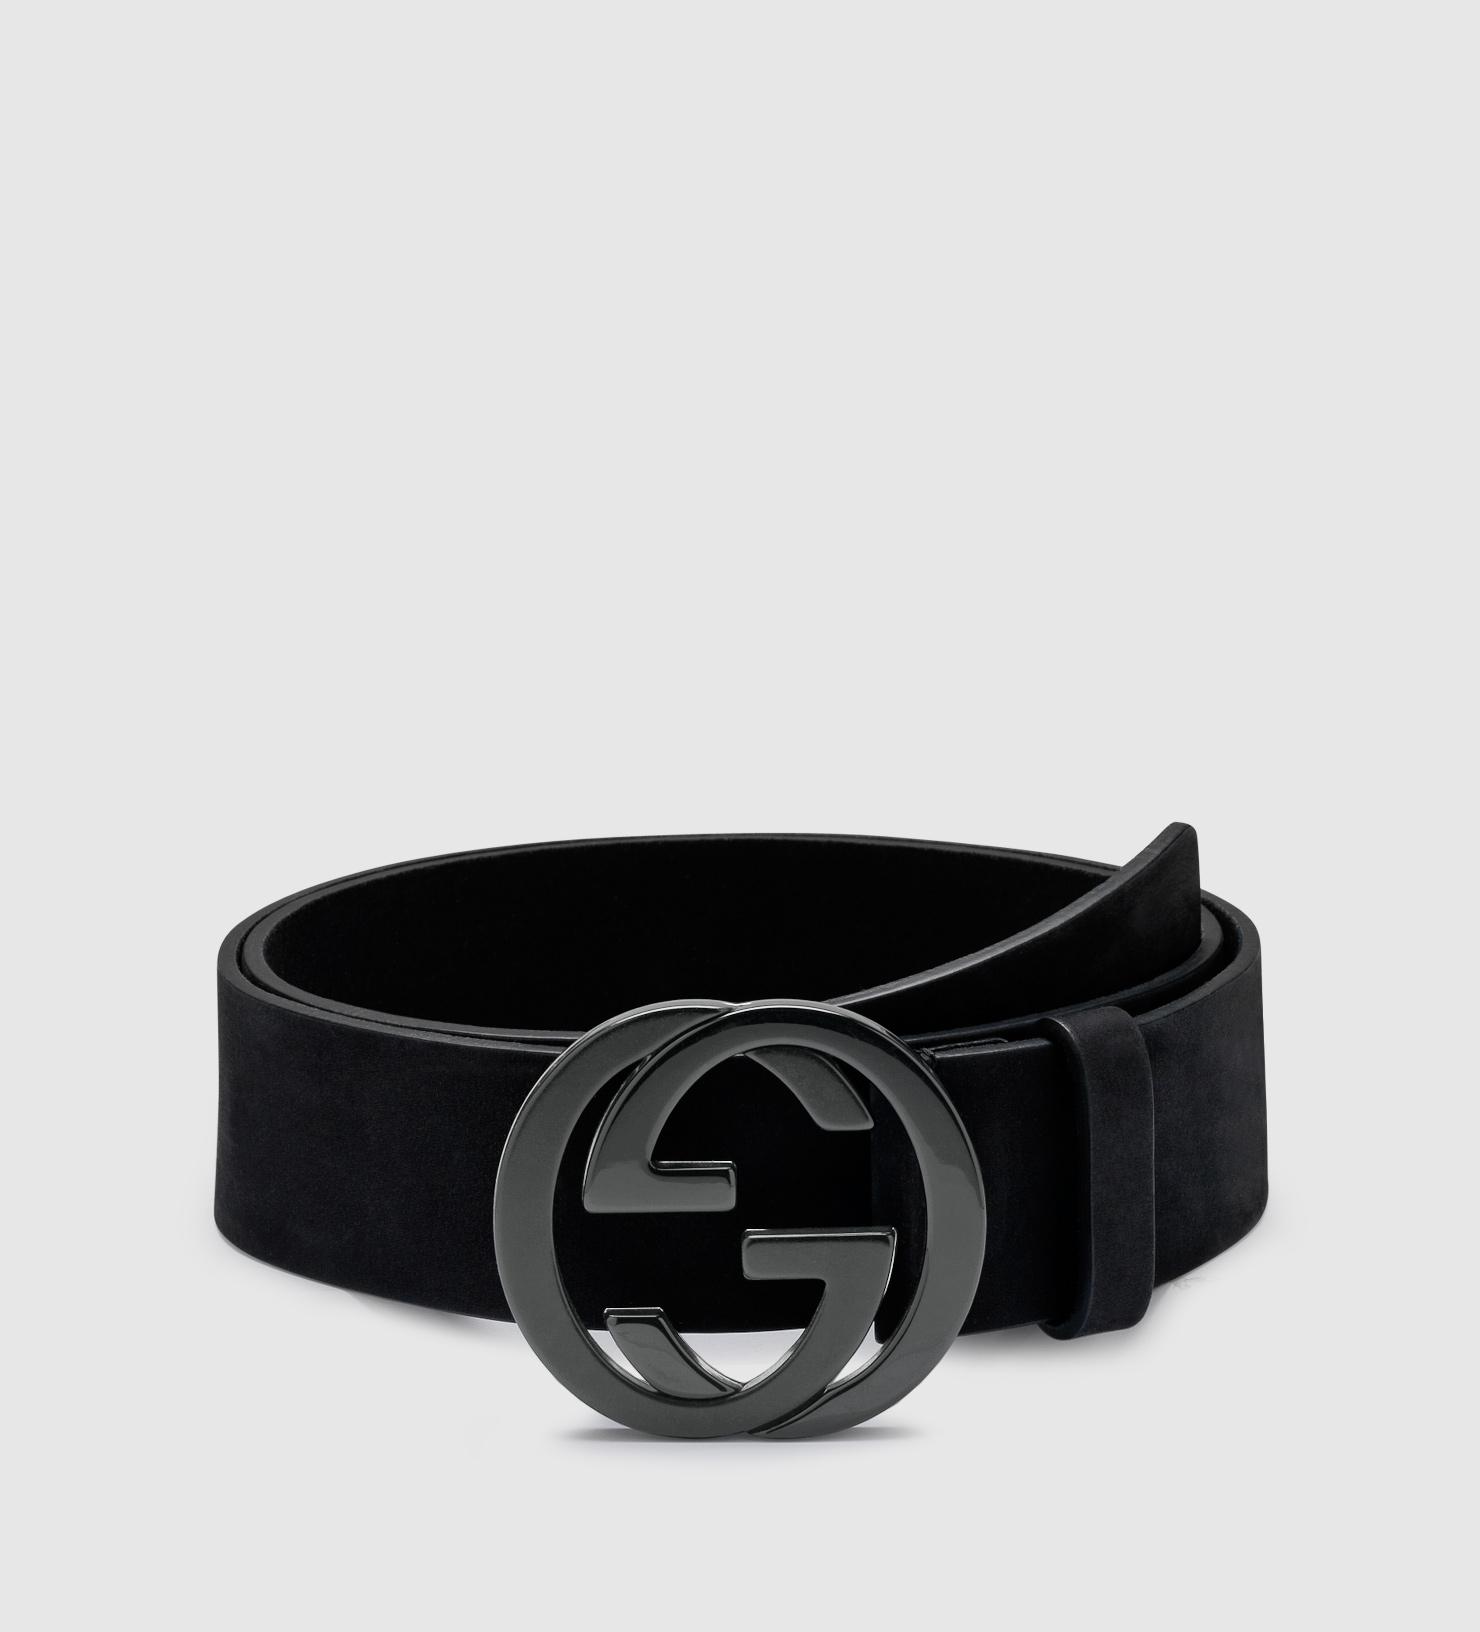 Gucci Black Suede Belt With Interlocking G Buckle for men